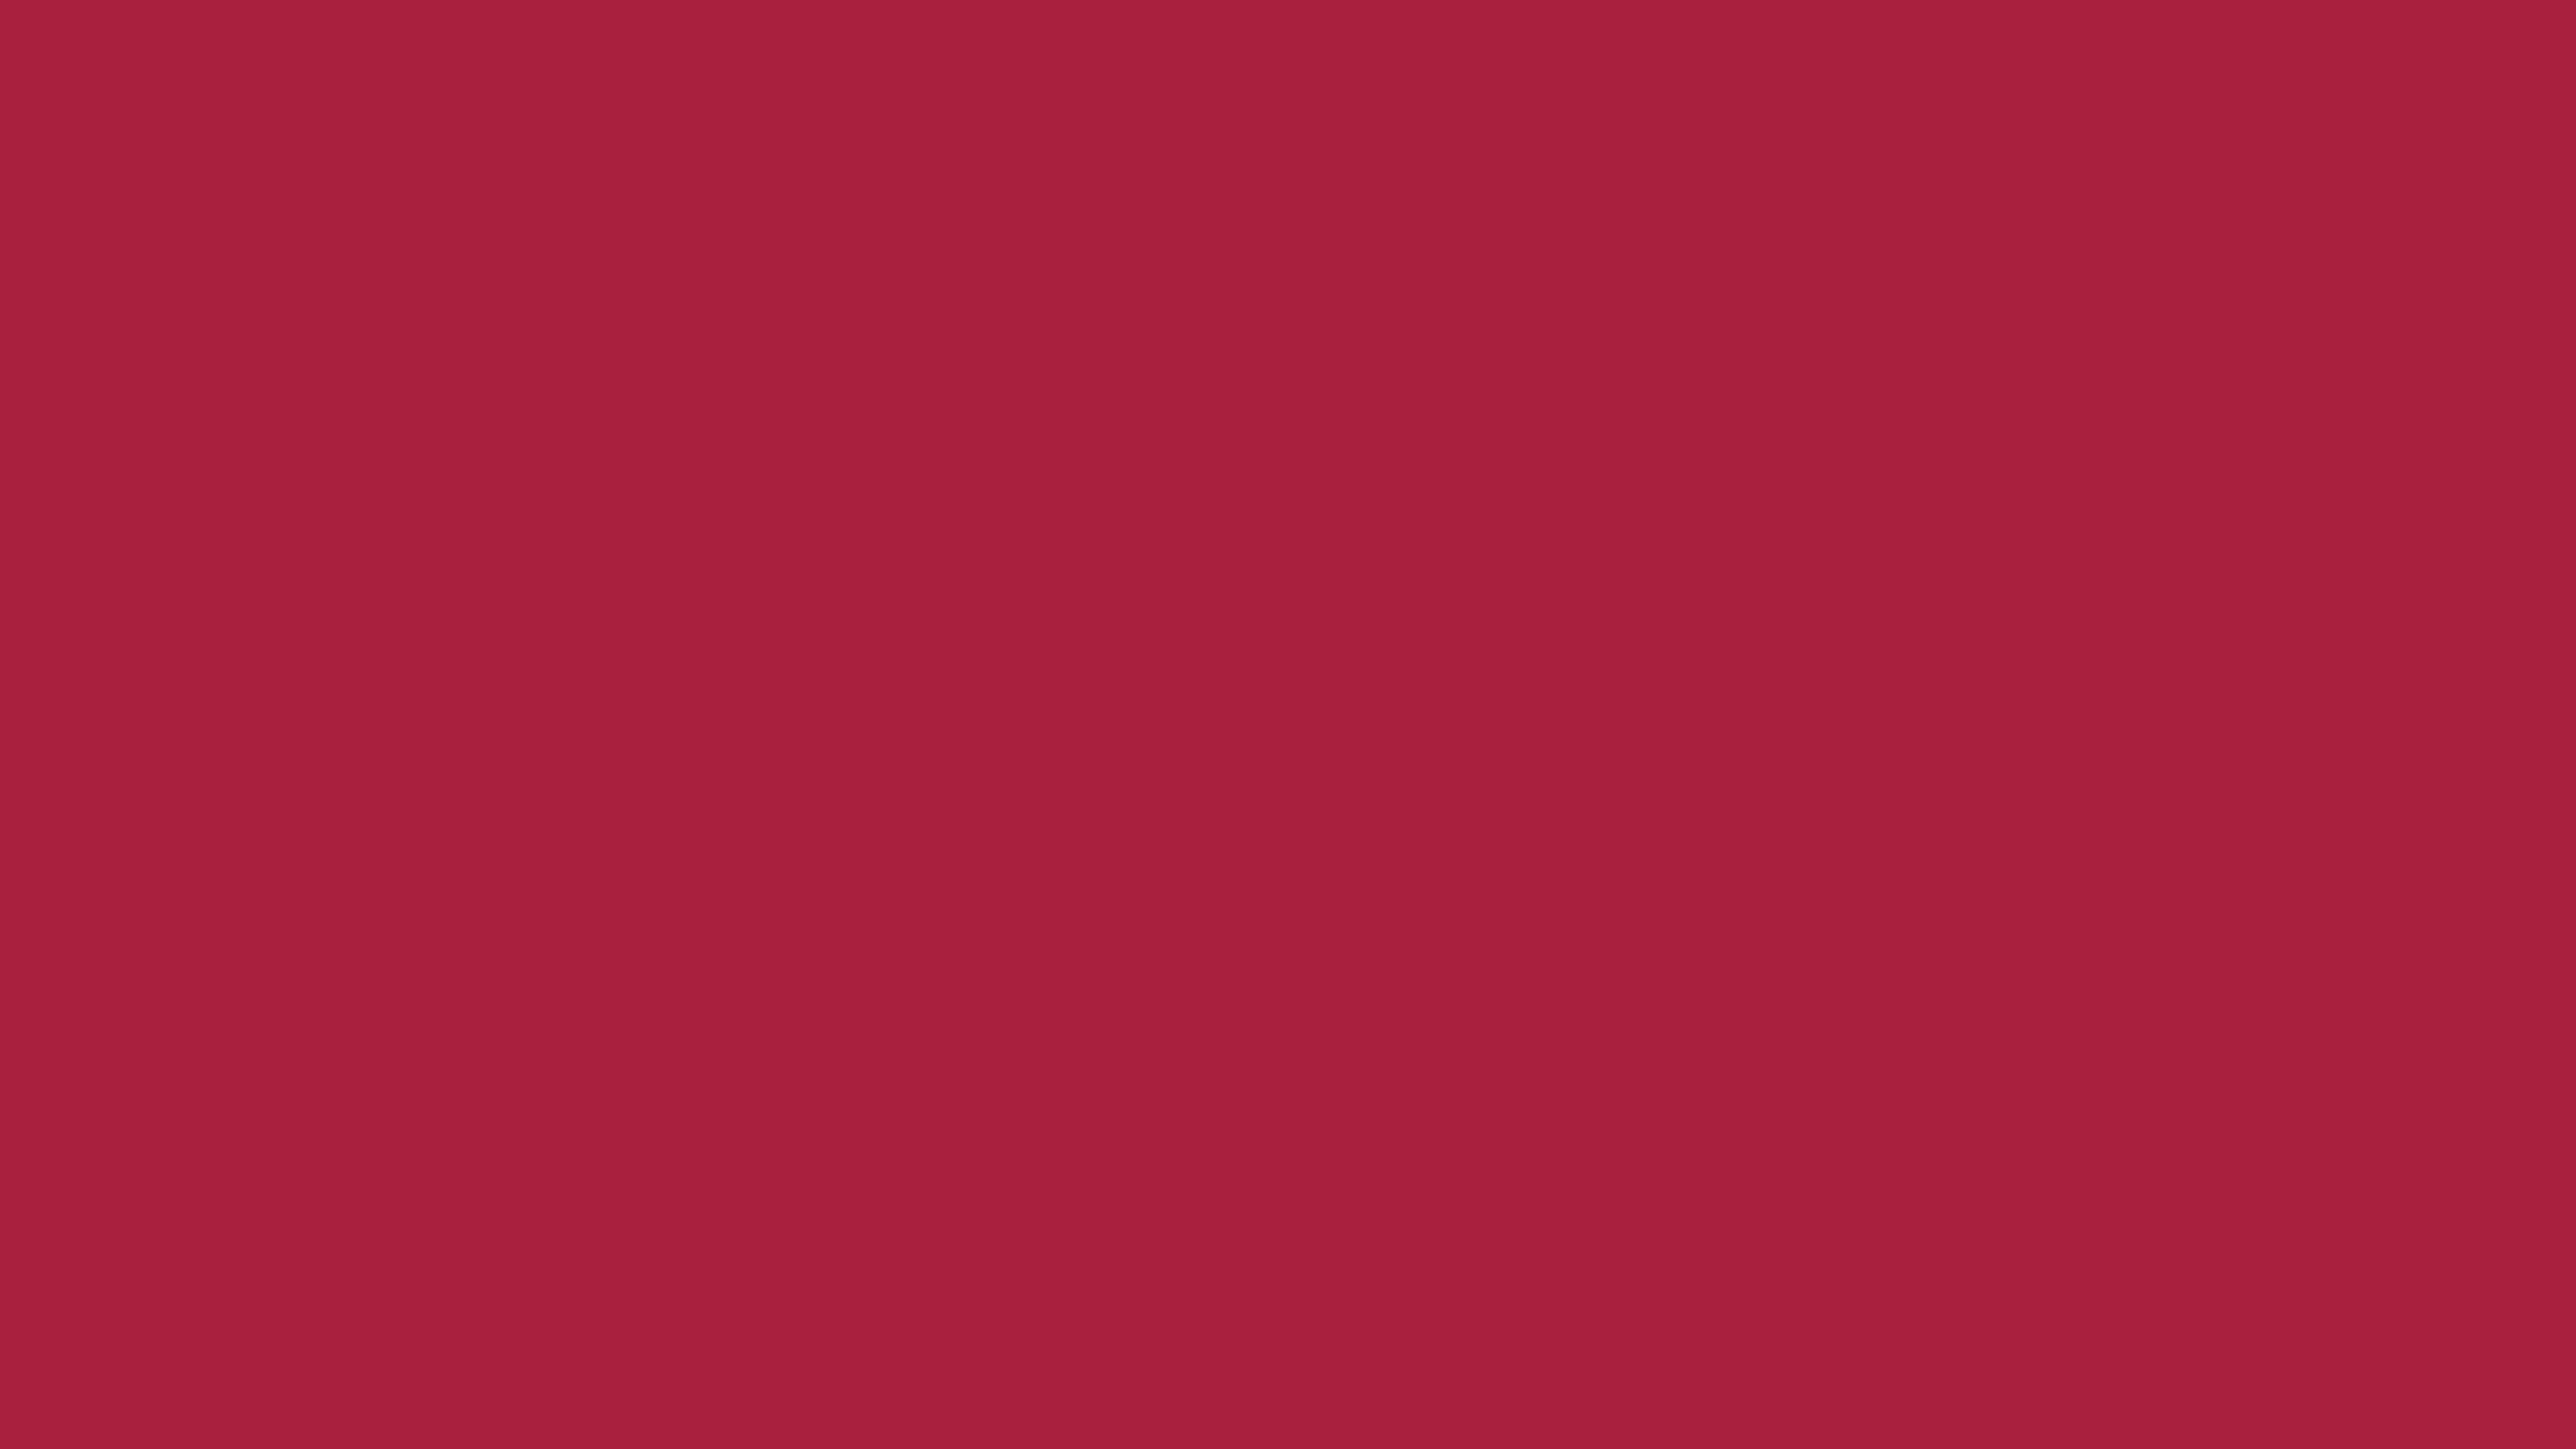 3840x2160 Deep Carmine Solid Color Background